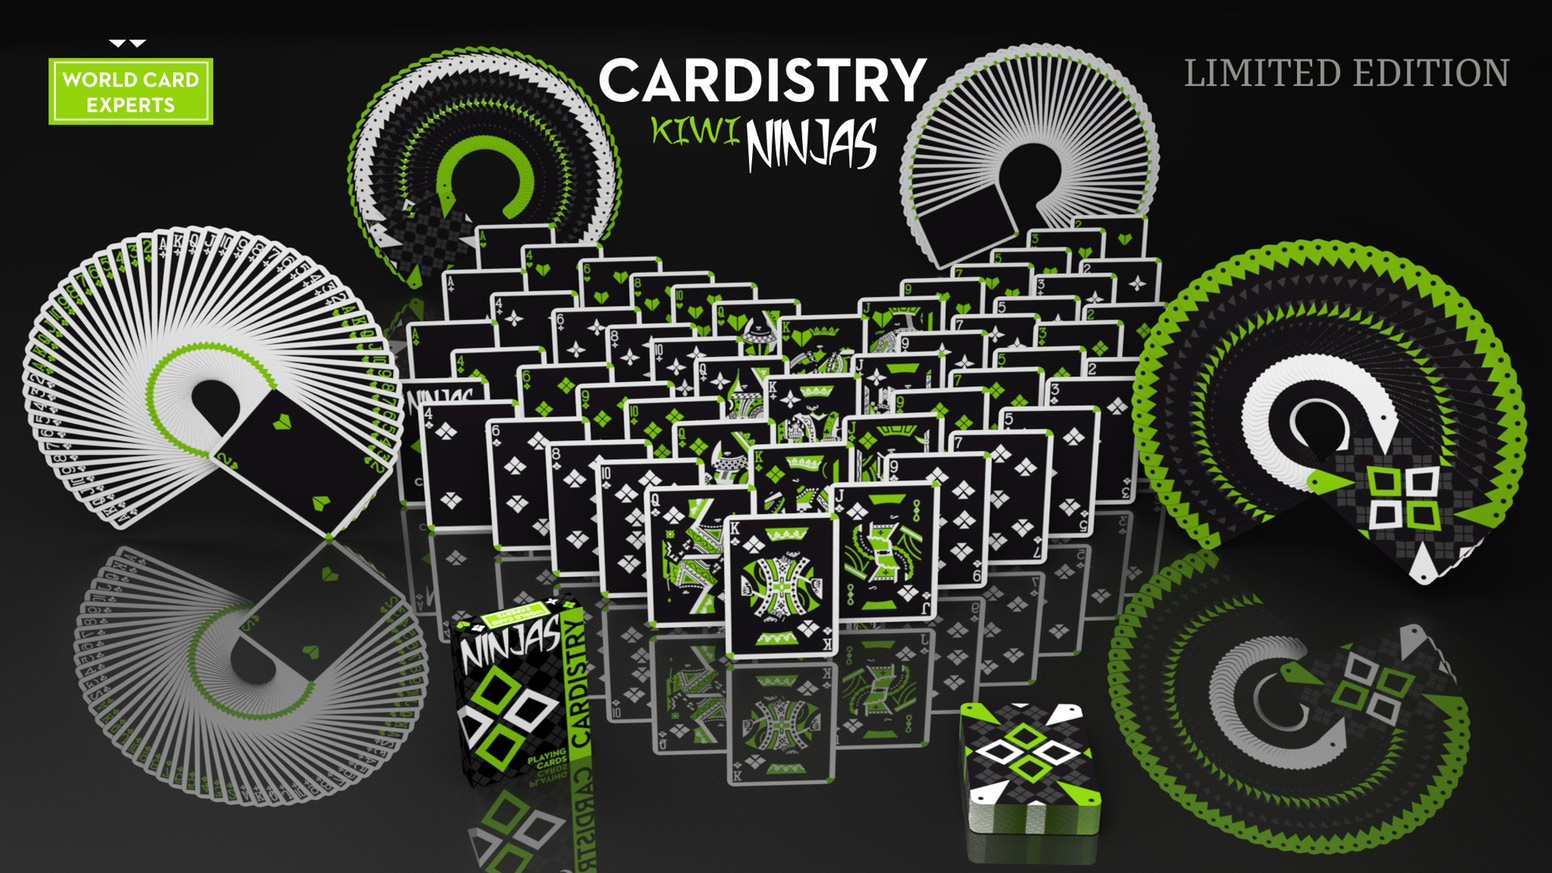 Cardistry Ninjas Kiwi